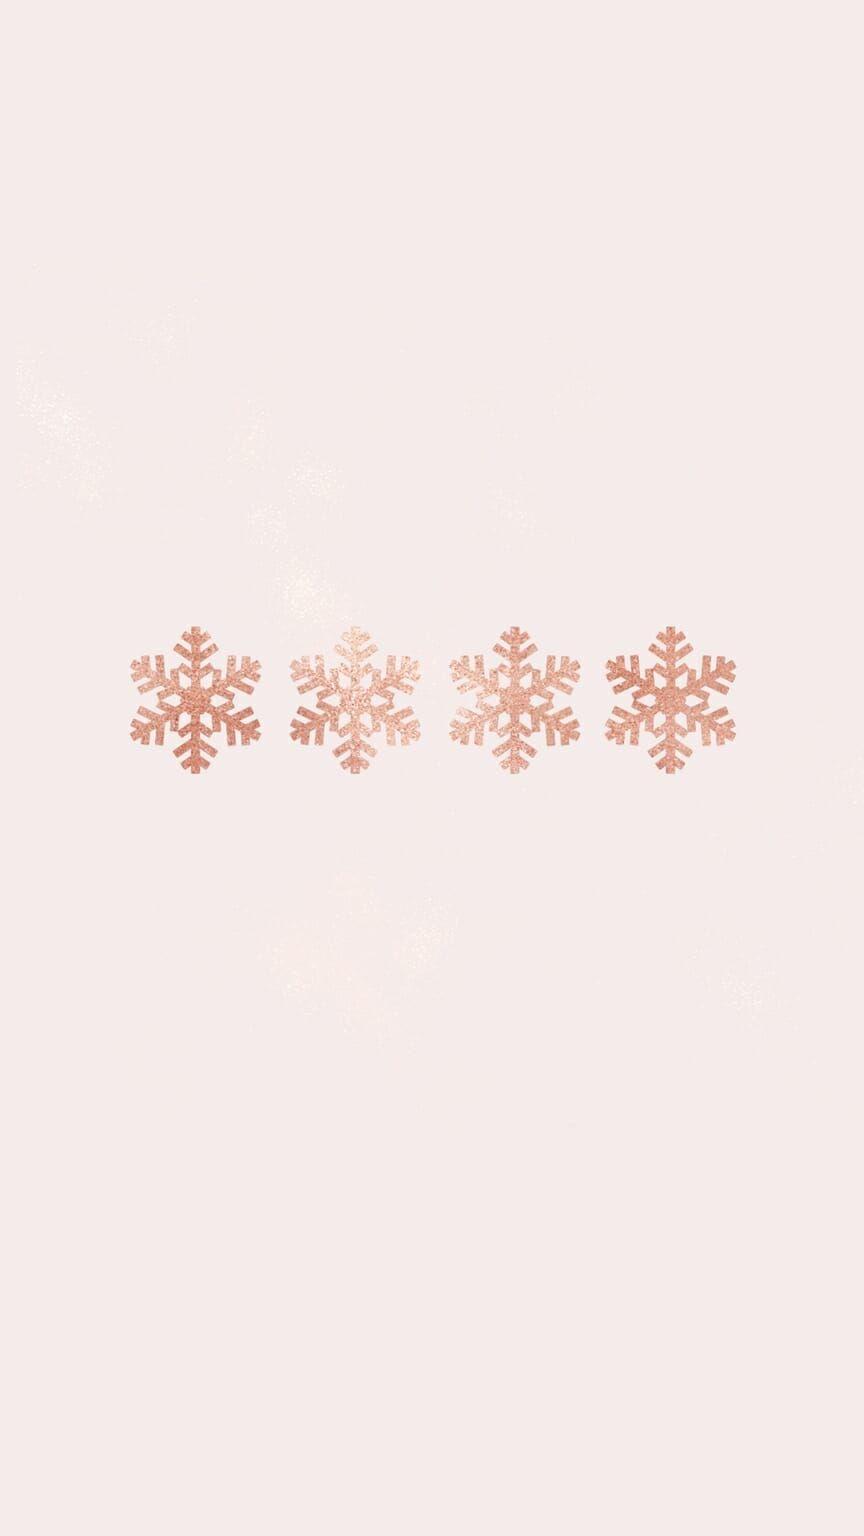 50 Free Stunning Christmas Wallpaper Backgrounds For Iphone Christmas Phone Wallpaper Wallpaper Iphone Christmas Xmas Wallpaper